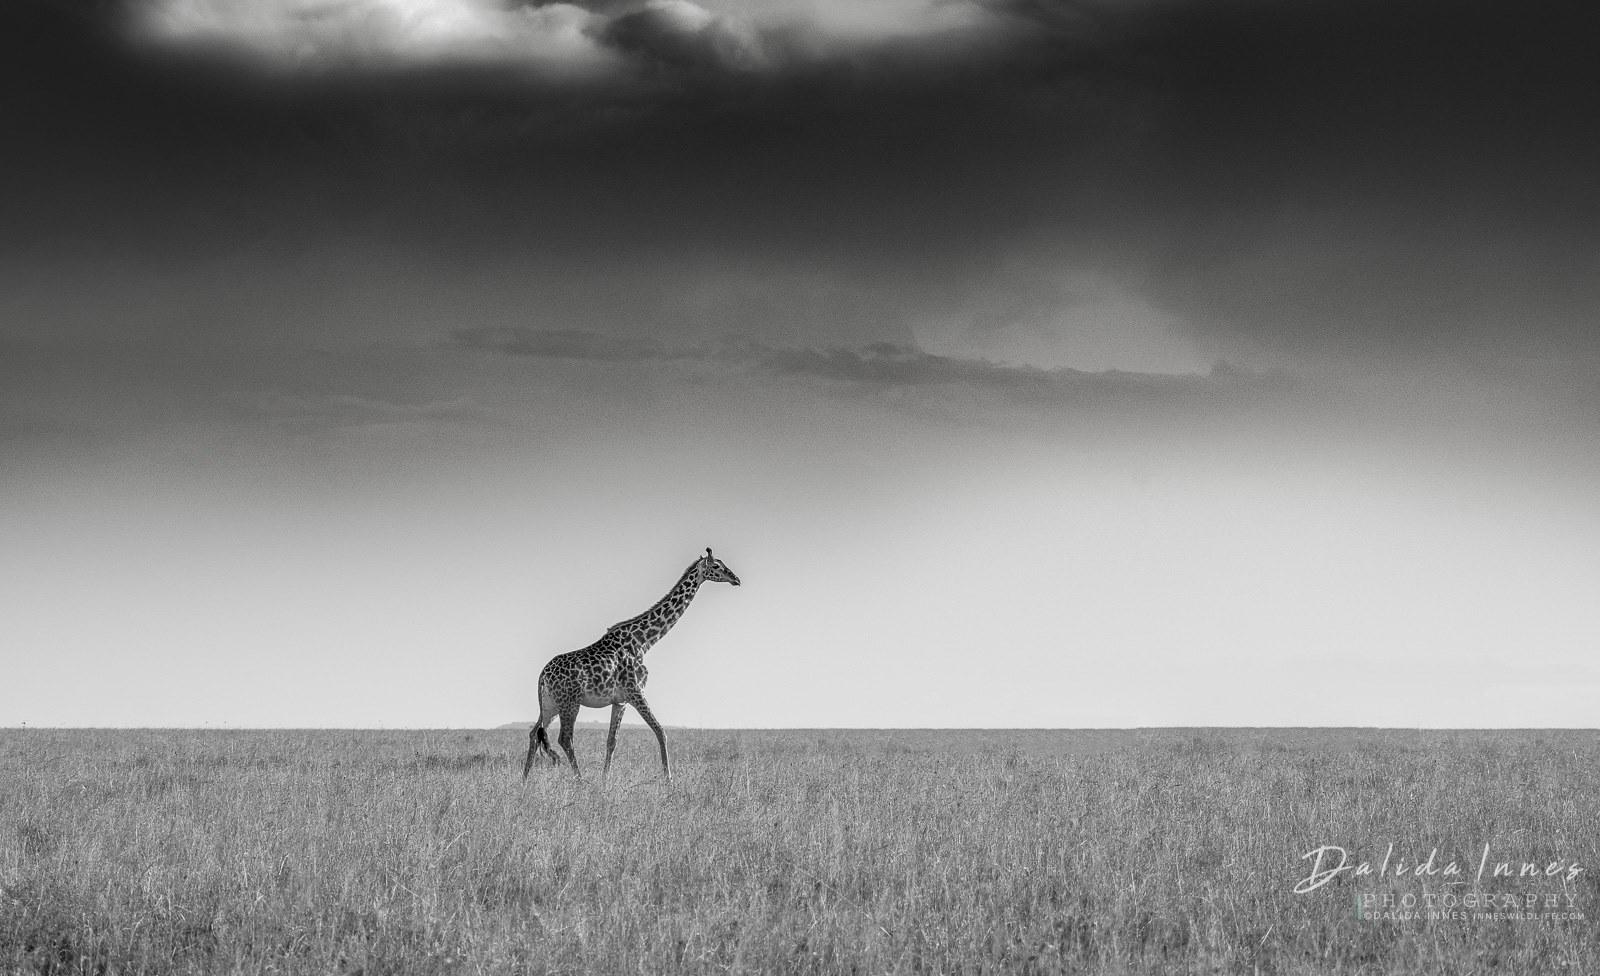 A lonely giraffe in the Serenget byi Dalida Innes Wildlife Photography